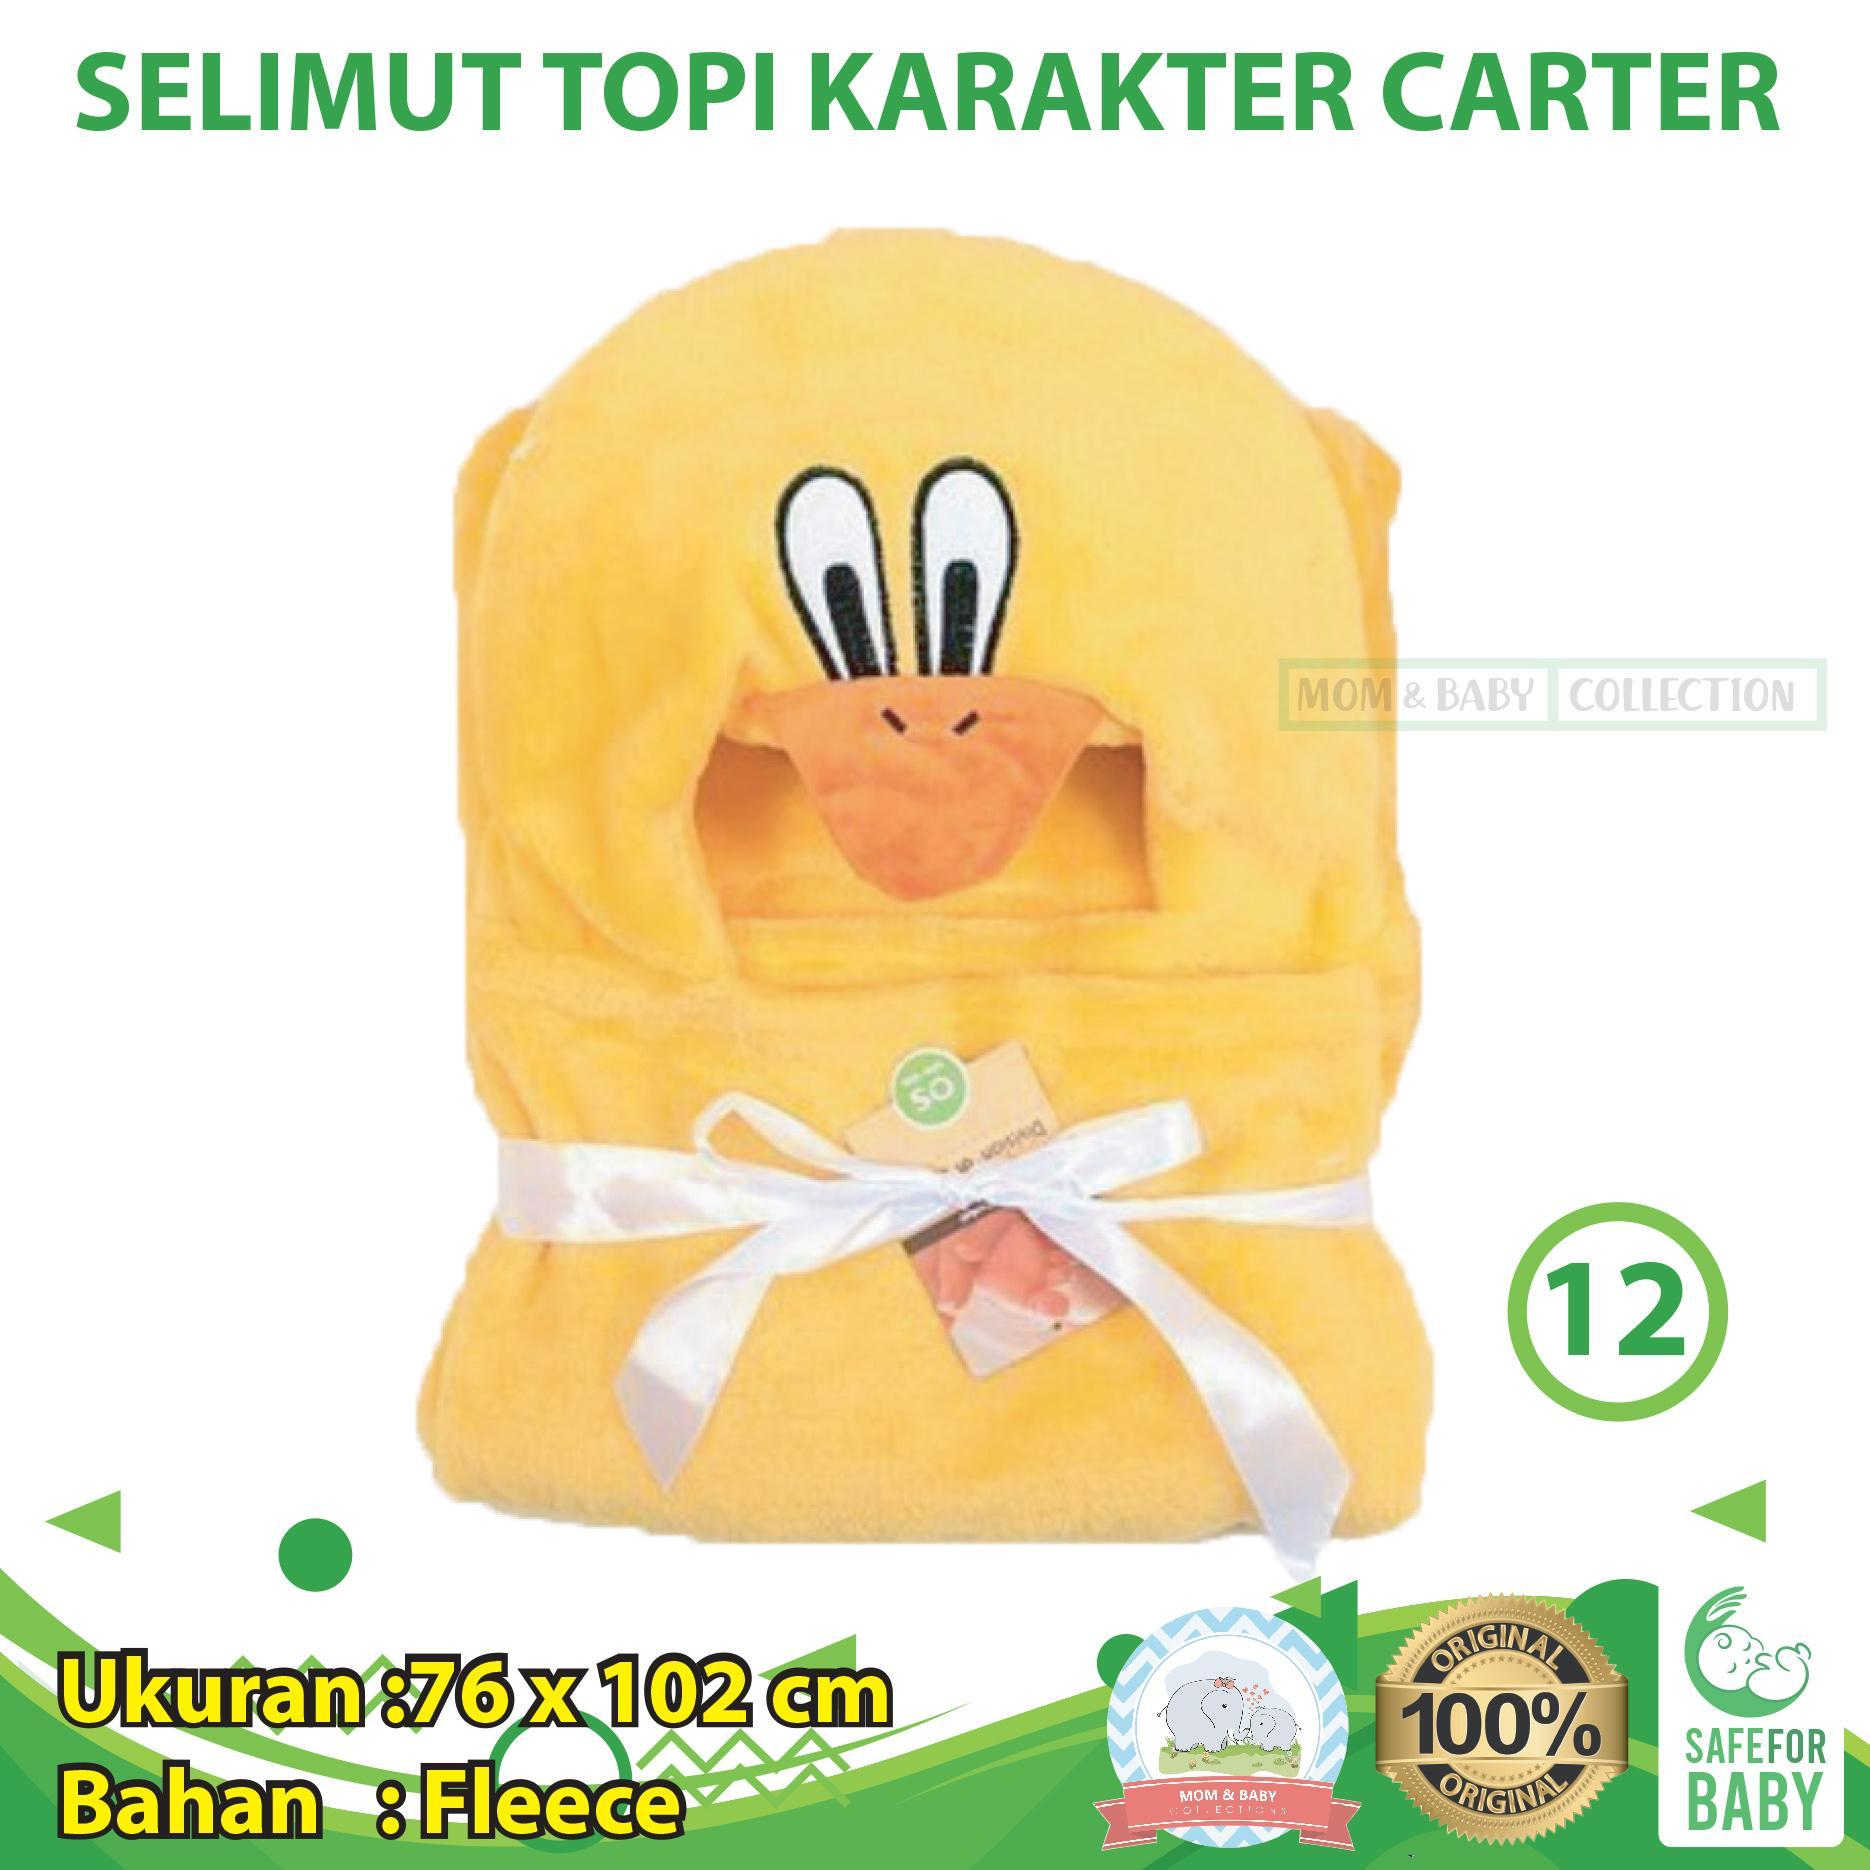 Selimut Topi Karakter Carter / Selimut Topi Bayi